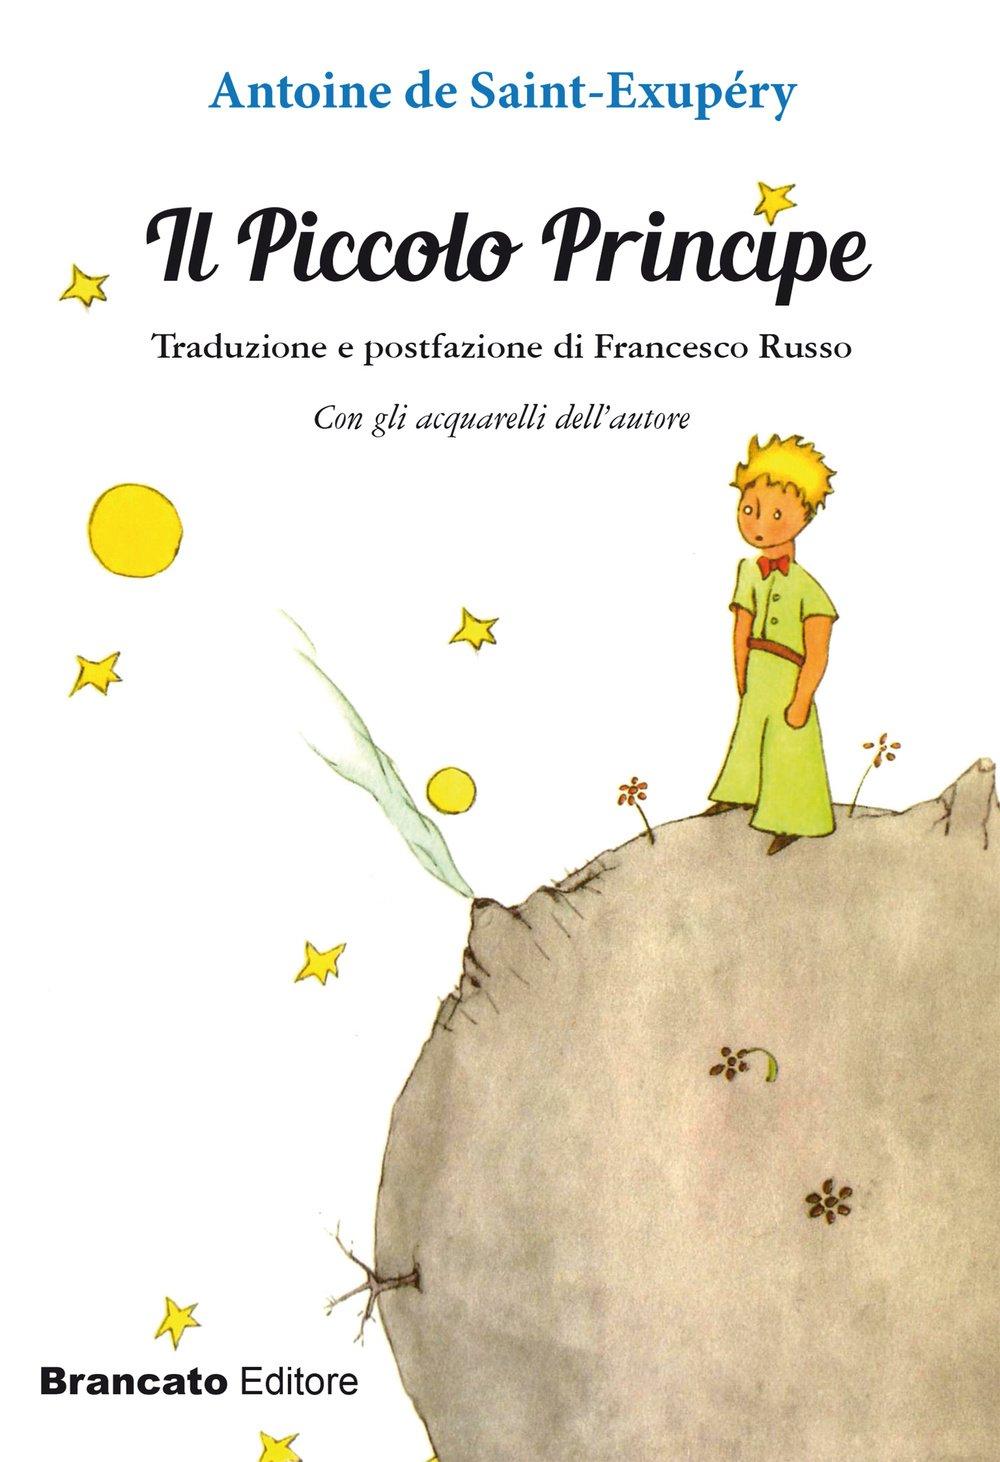 Il Piccolo Principe: Amazon.es: Antoine de Saint-Exupéry, F ...